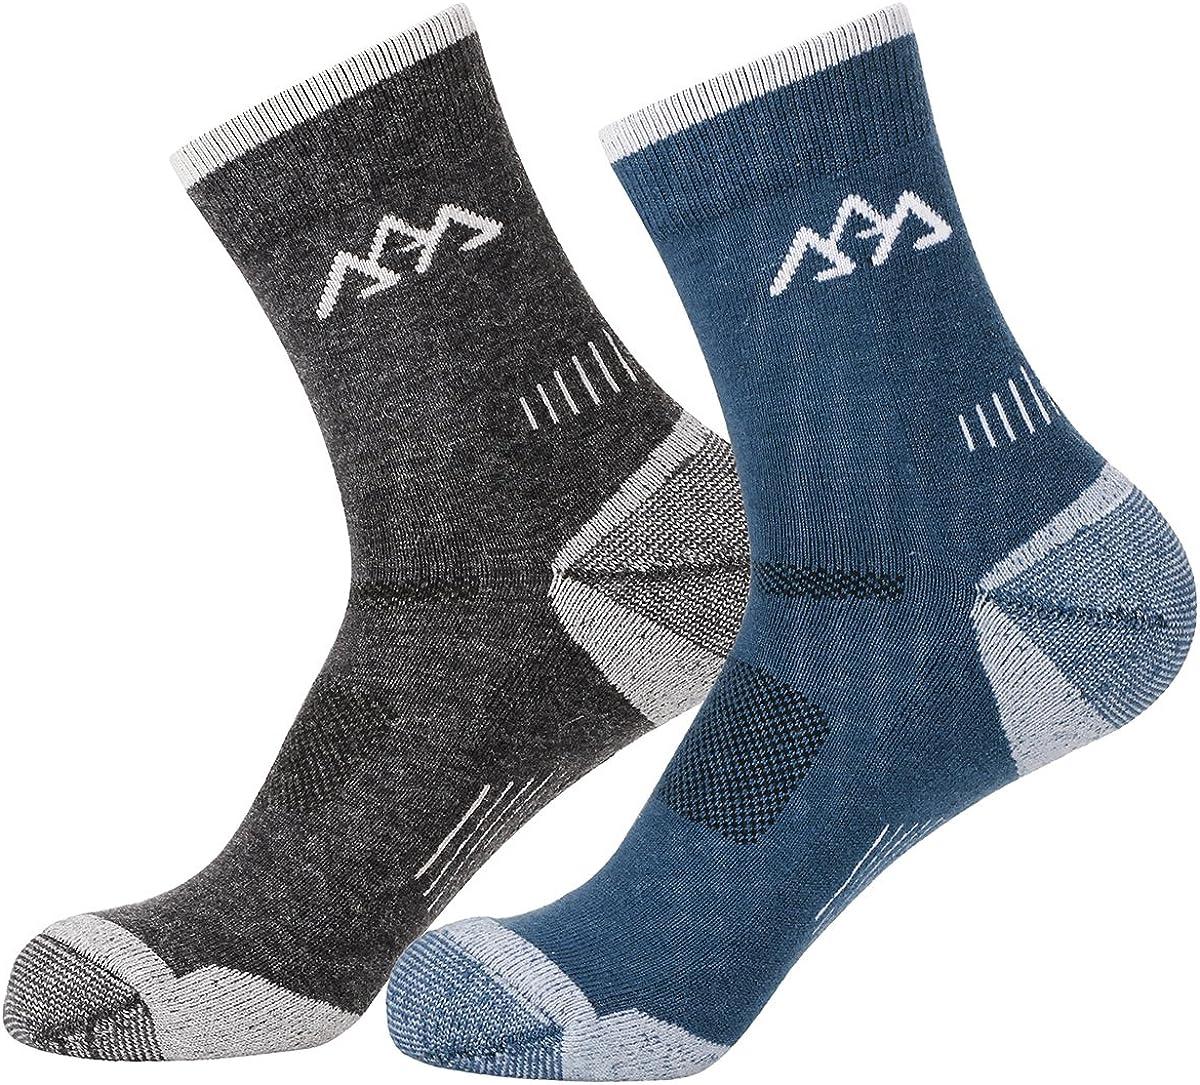 innotree Merino Wool Men's Hiking Socks, 2 Pairs Wicking Cushion Crew Socks, Mid-thickness Trekking Athletic Running Socks for Outdoor Sports, Camping, Skiing